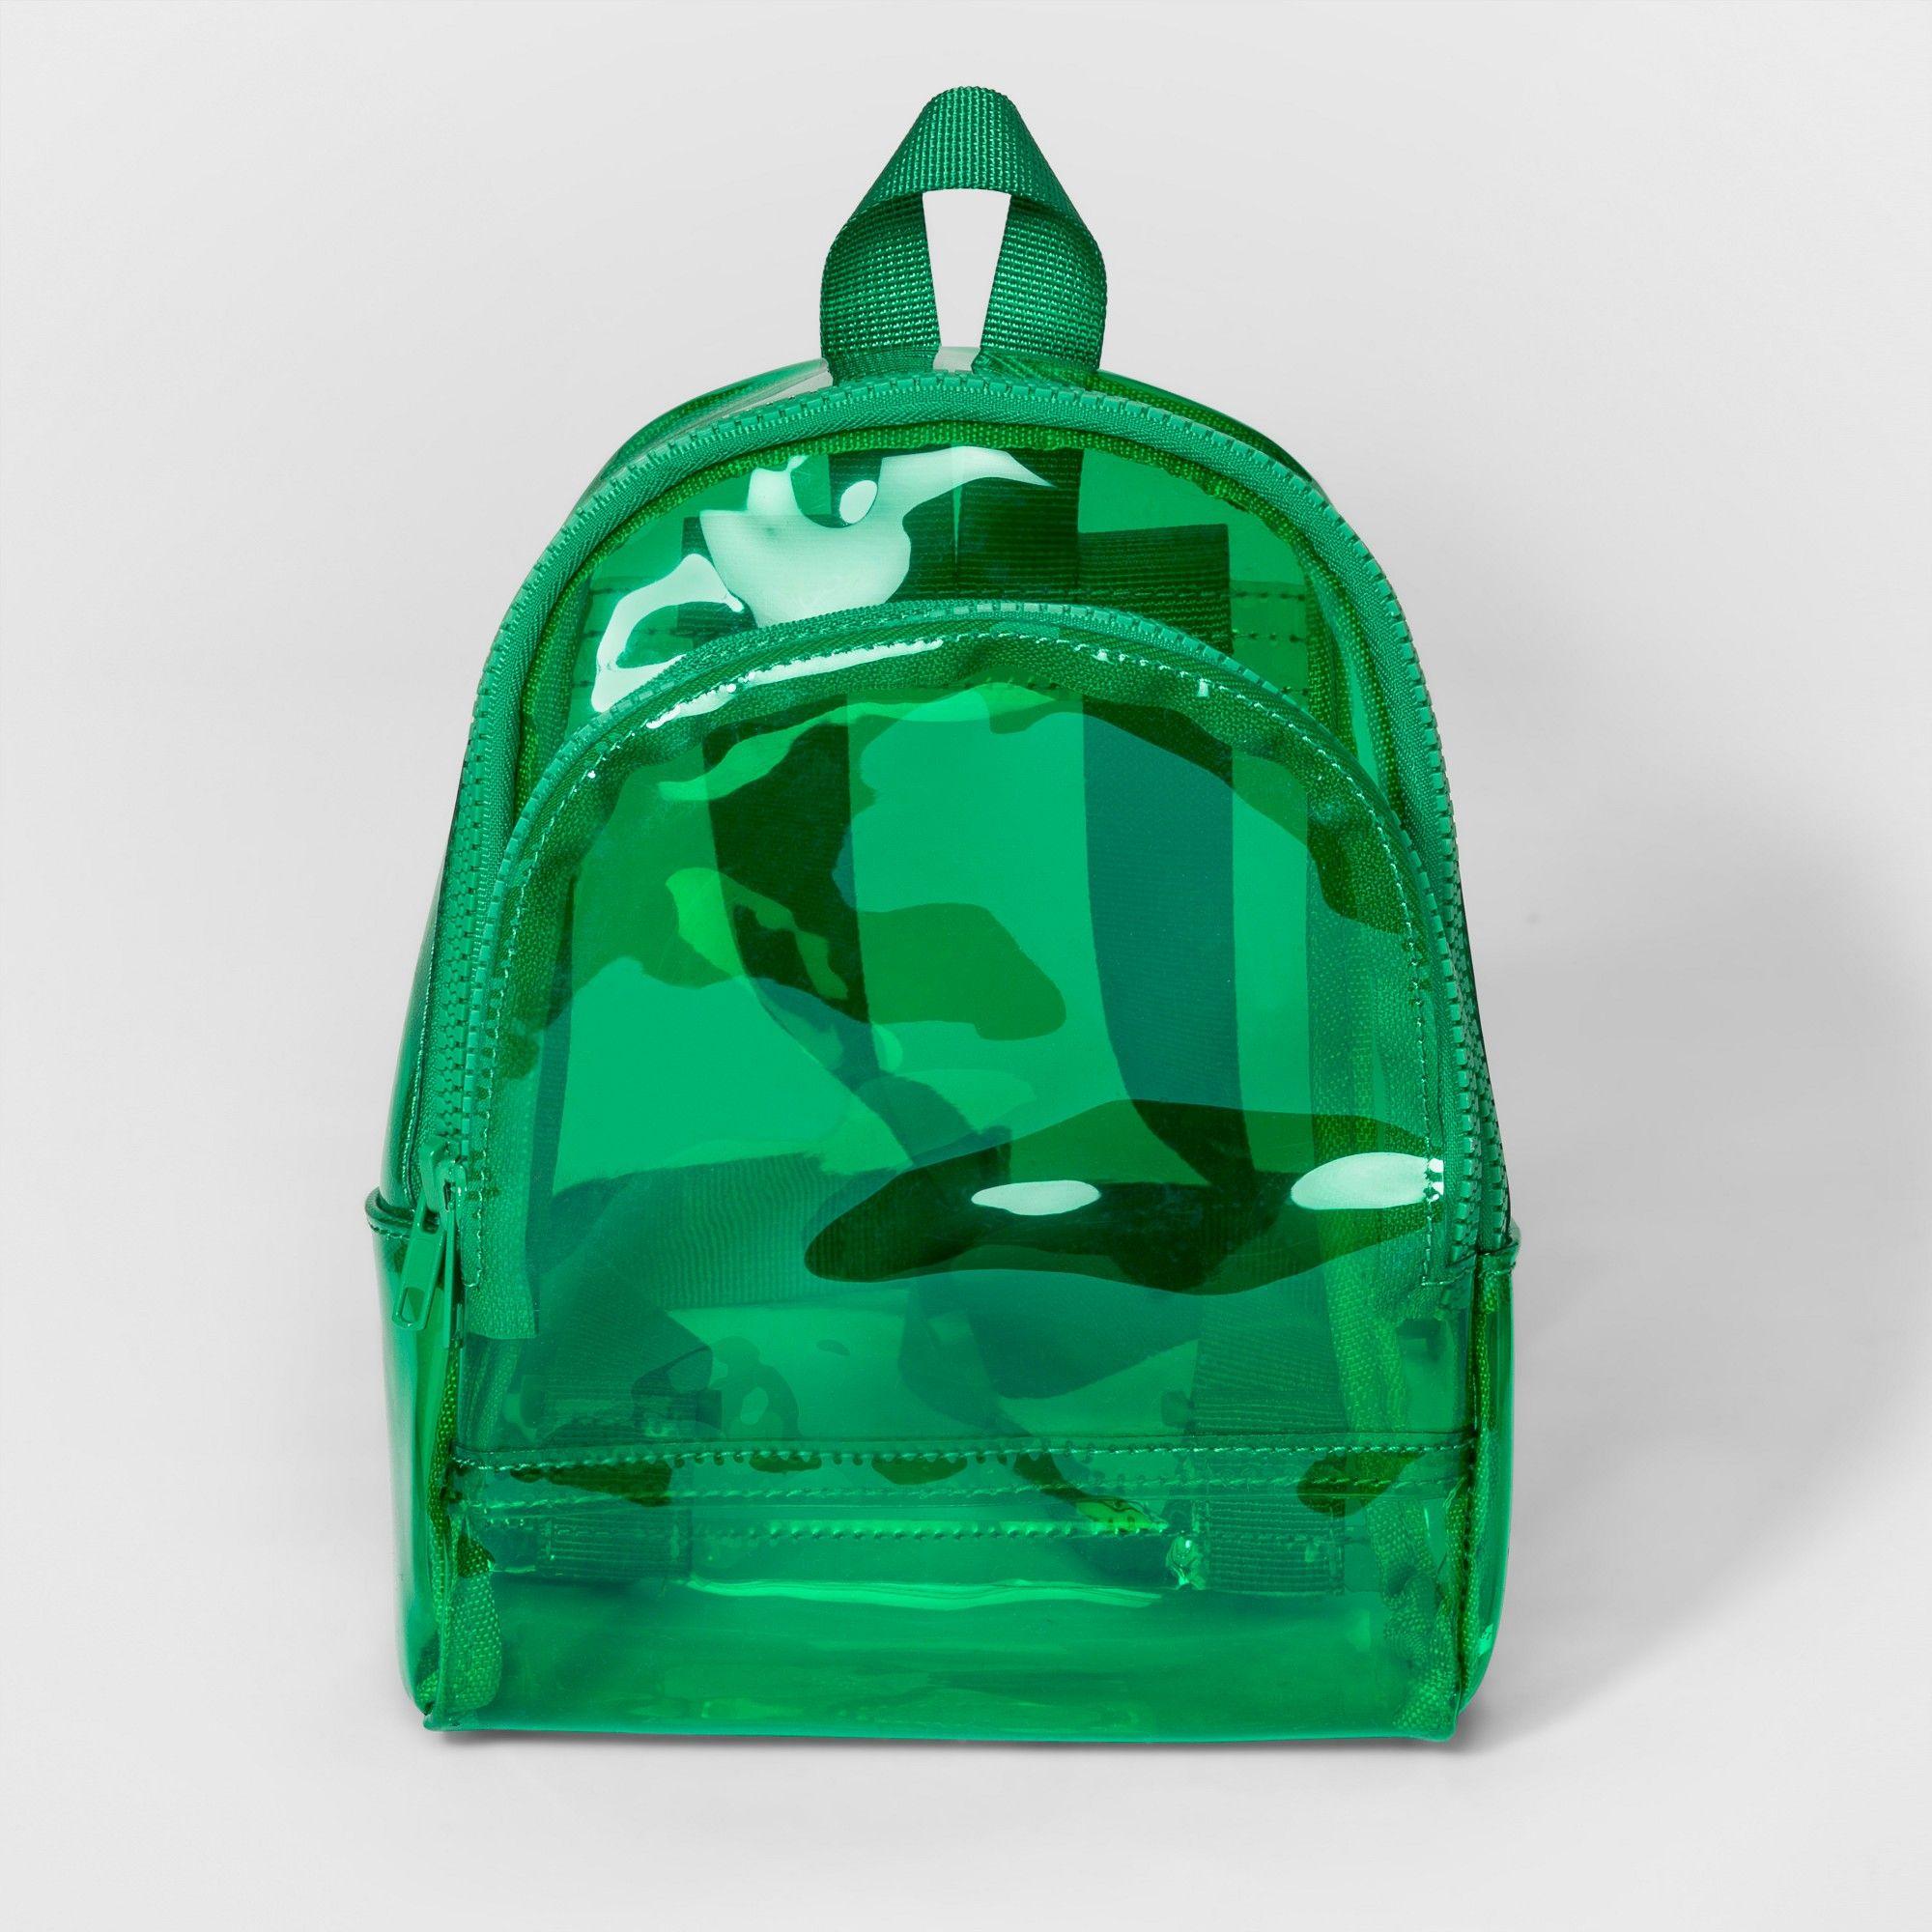 4c9d0f098f Women s Mini Jelly Backpack Handbag - Mossimo Supply Co. Green ...